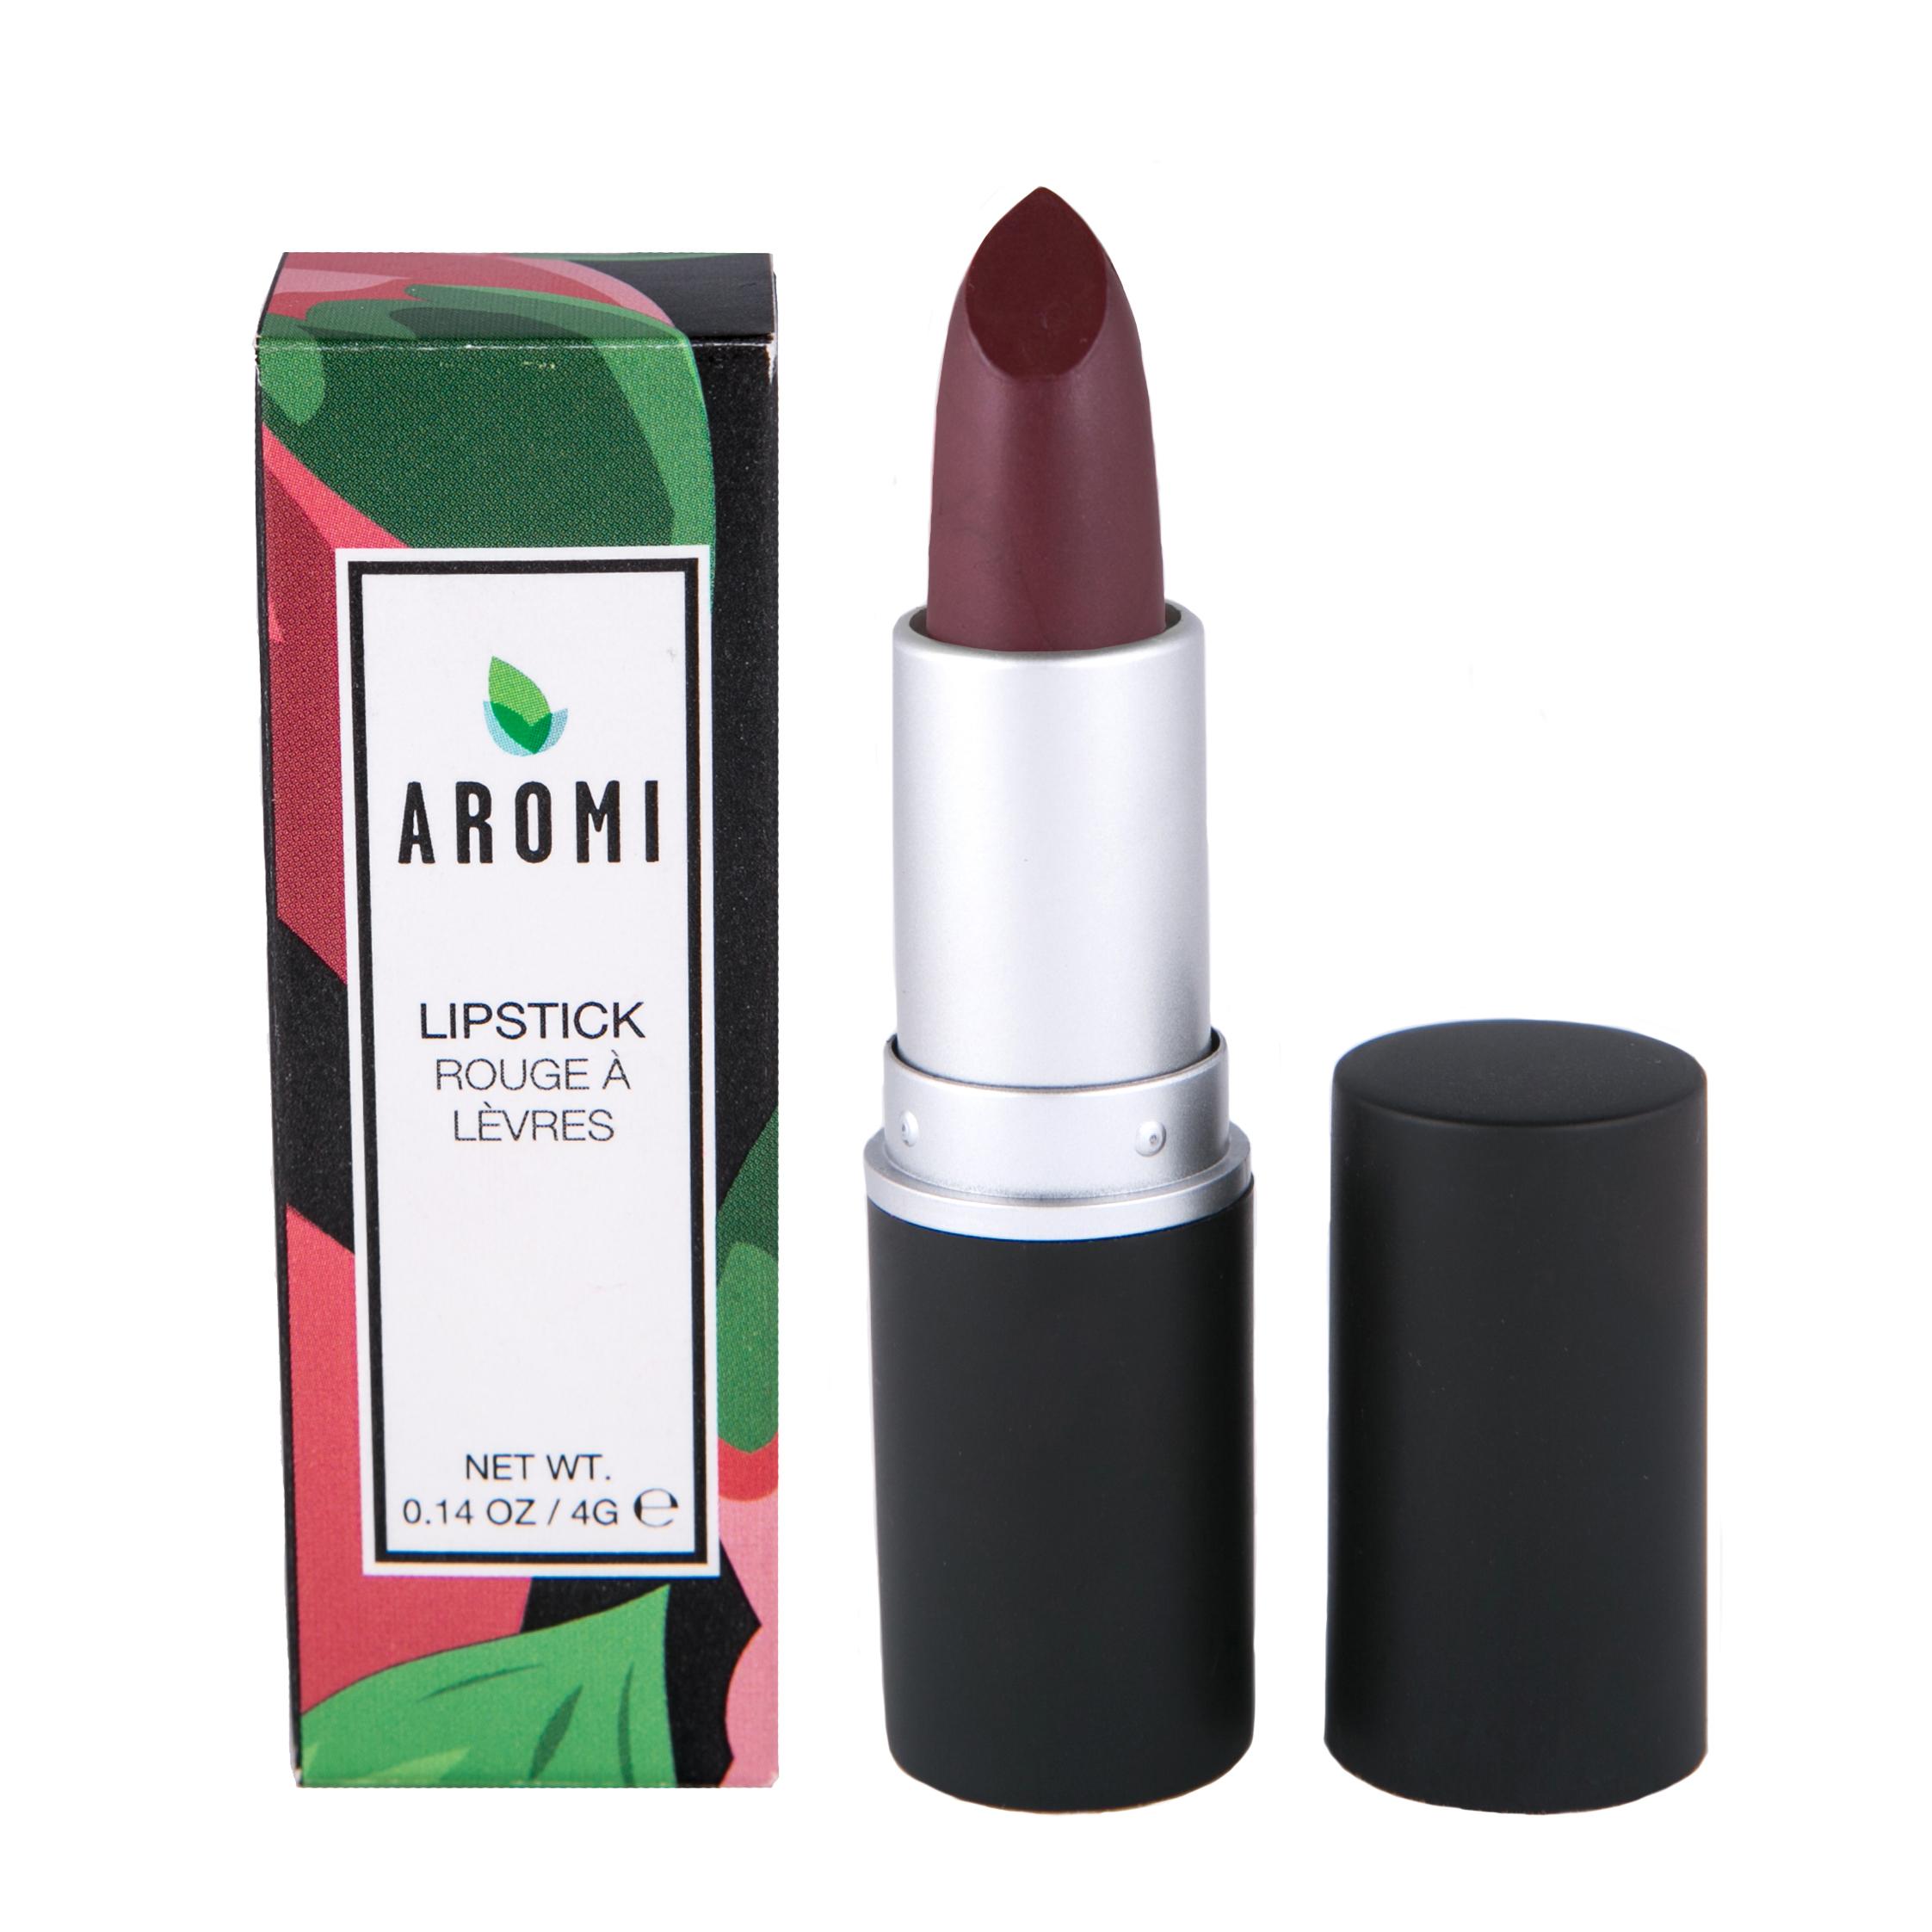 Aromi Merlot Lipstick